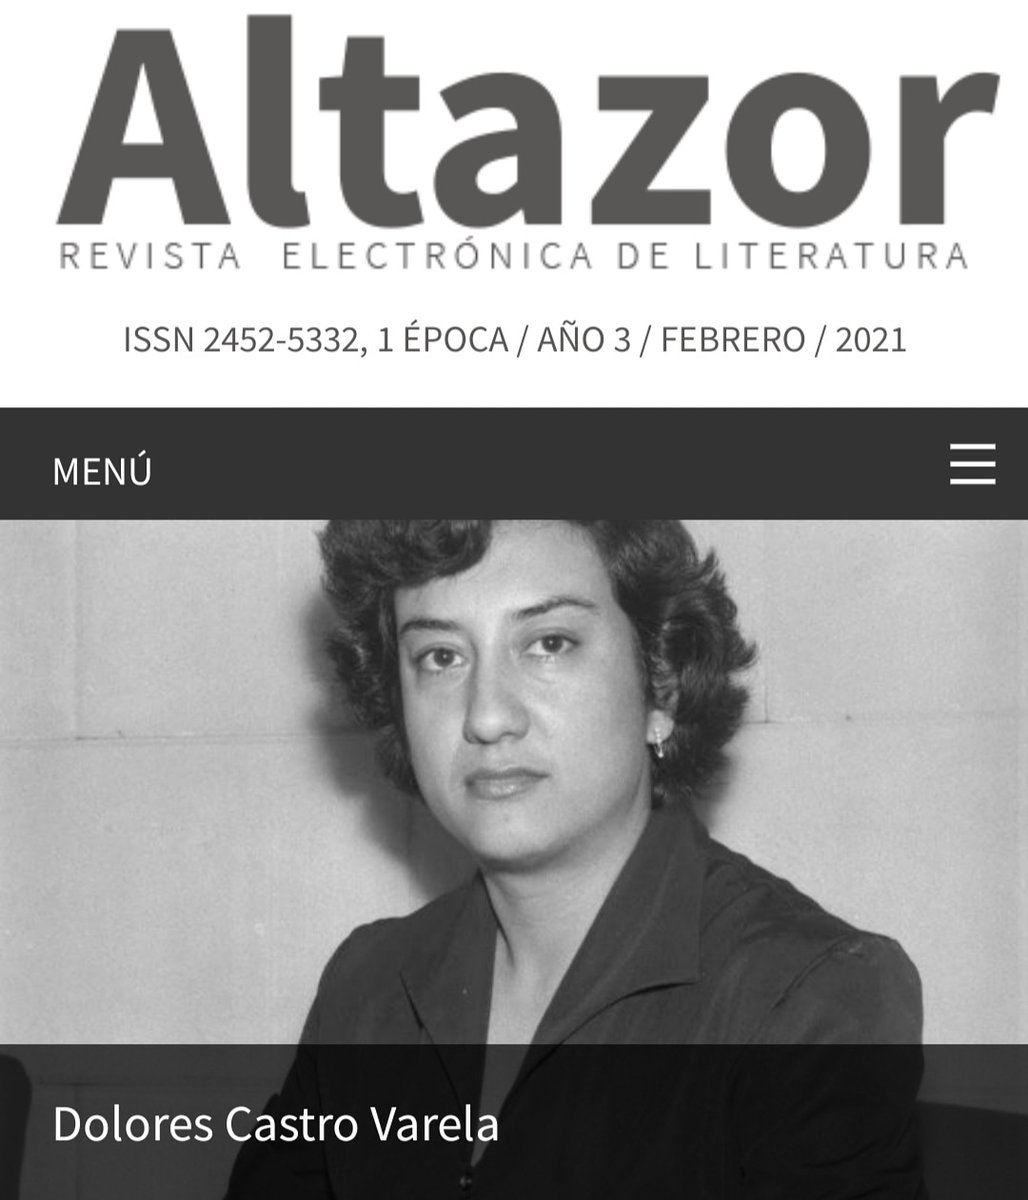 ¡Imperdible! Dolores Castro Varela.  Un verso que no se quiebra.  Carmen Nozal nos acerca a la obra de la enorme poeta mexicana.  Especial para revista Altazor. https://t.co/vWu4lZFjT1 https://t.co/Oi1NLiazL4